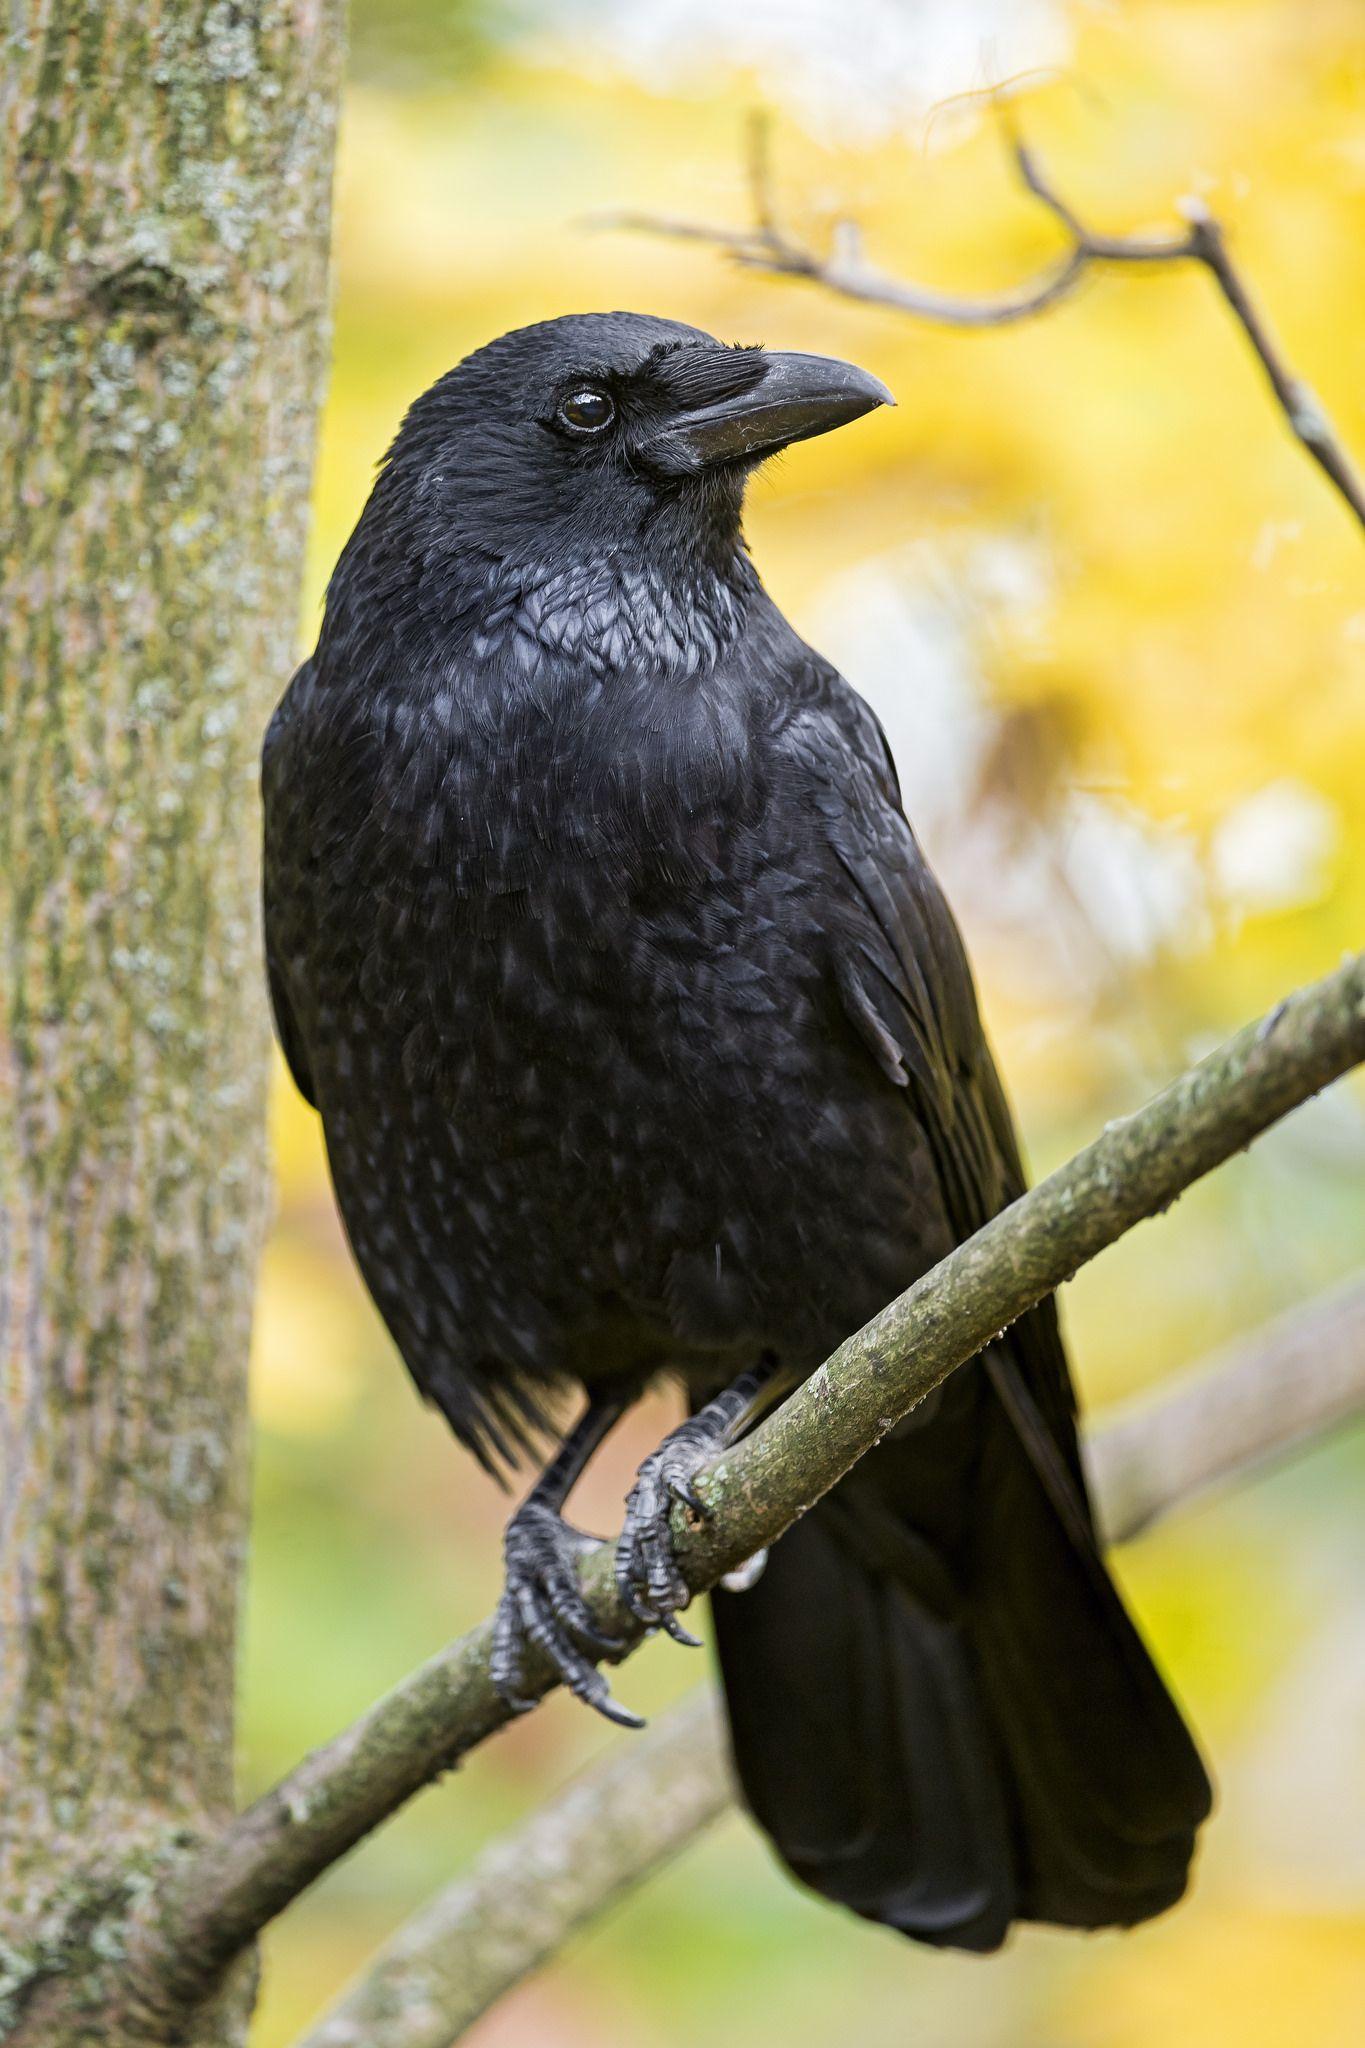 Crow on the tree | Crow, Crow bird, Raven bird